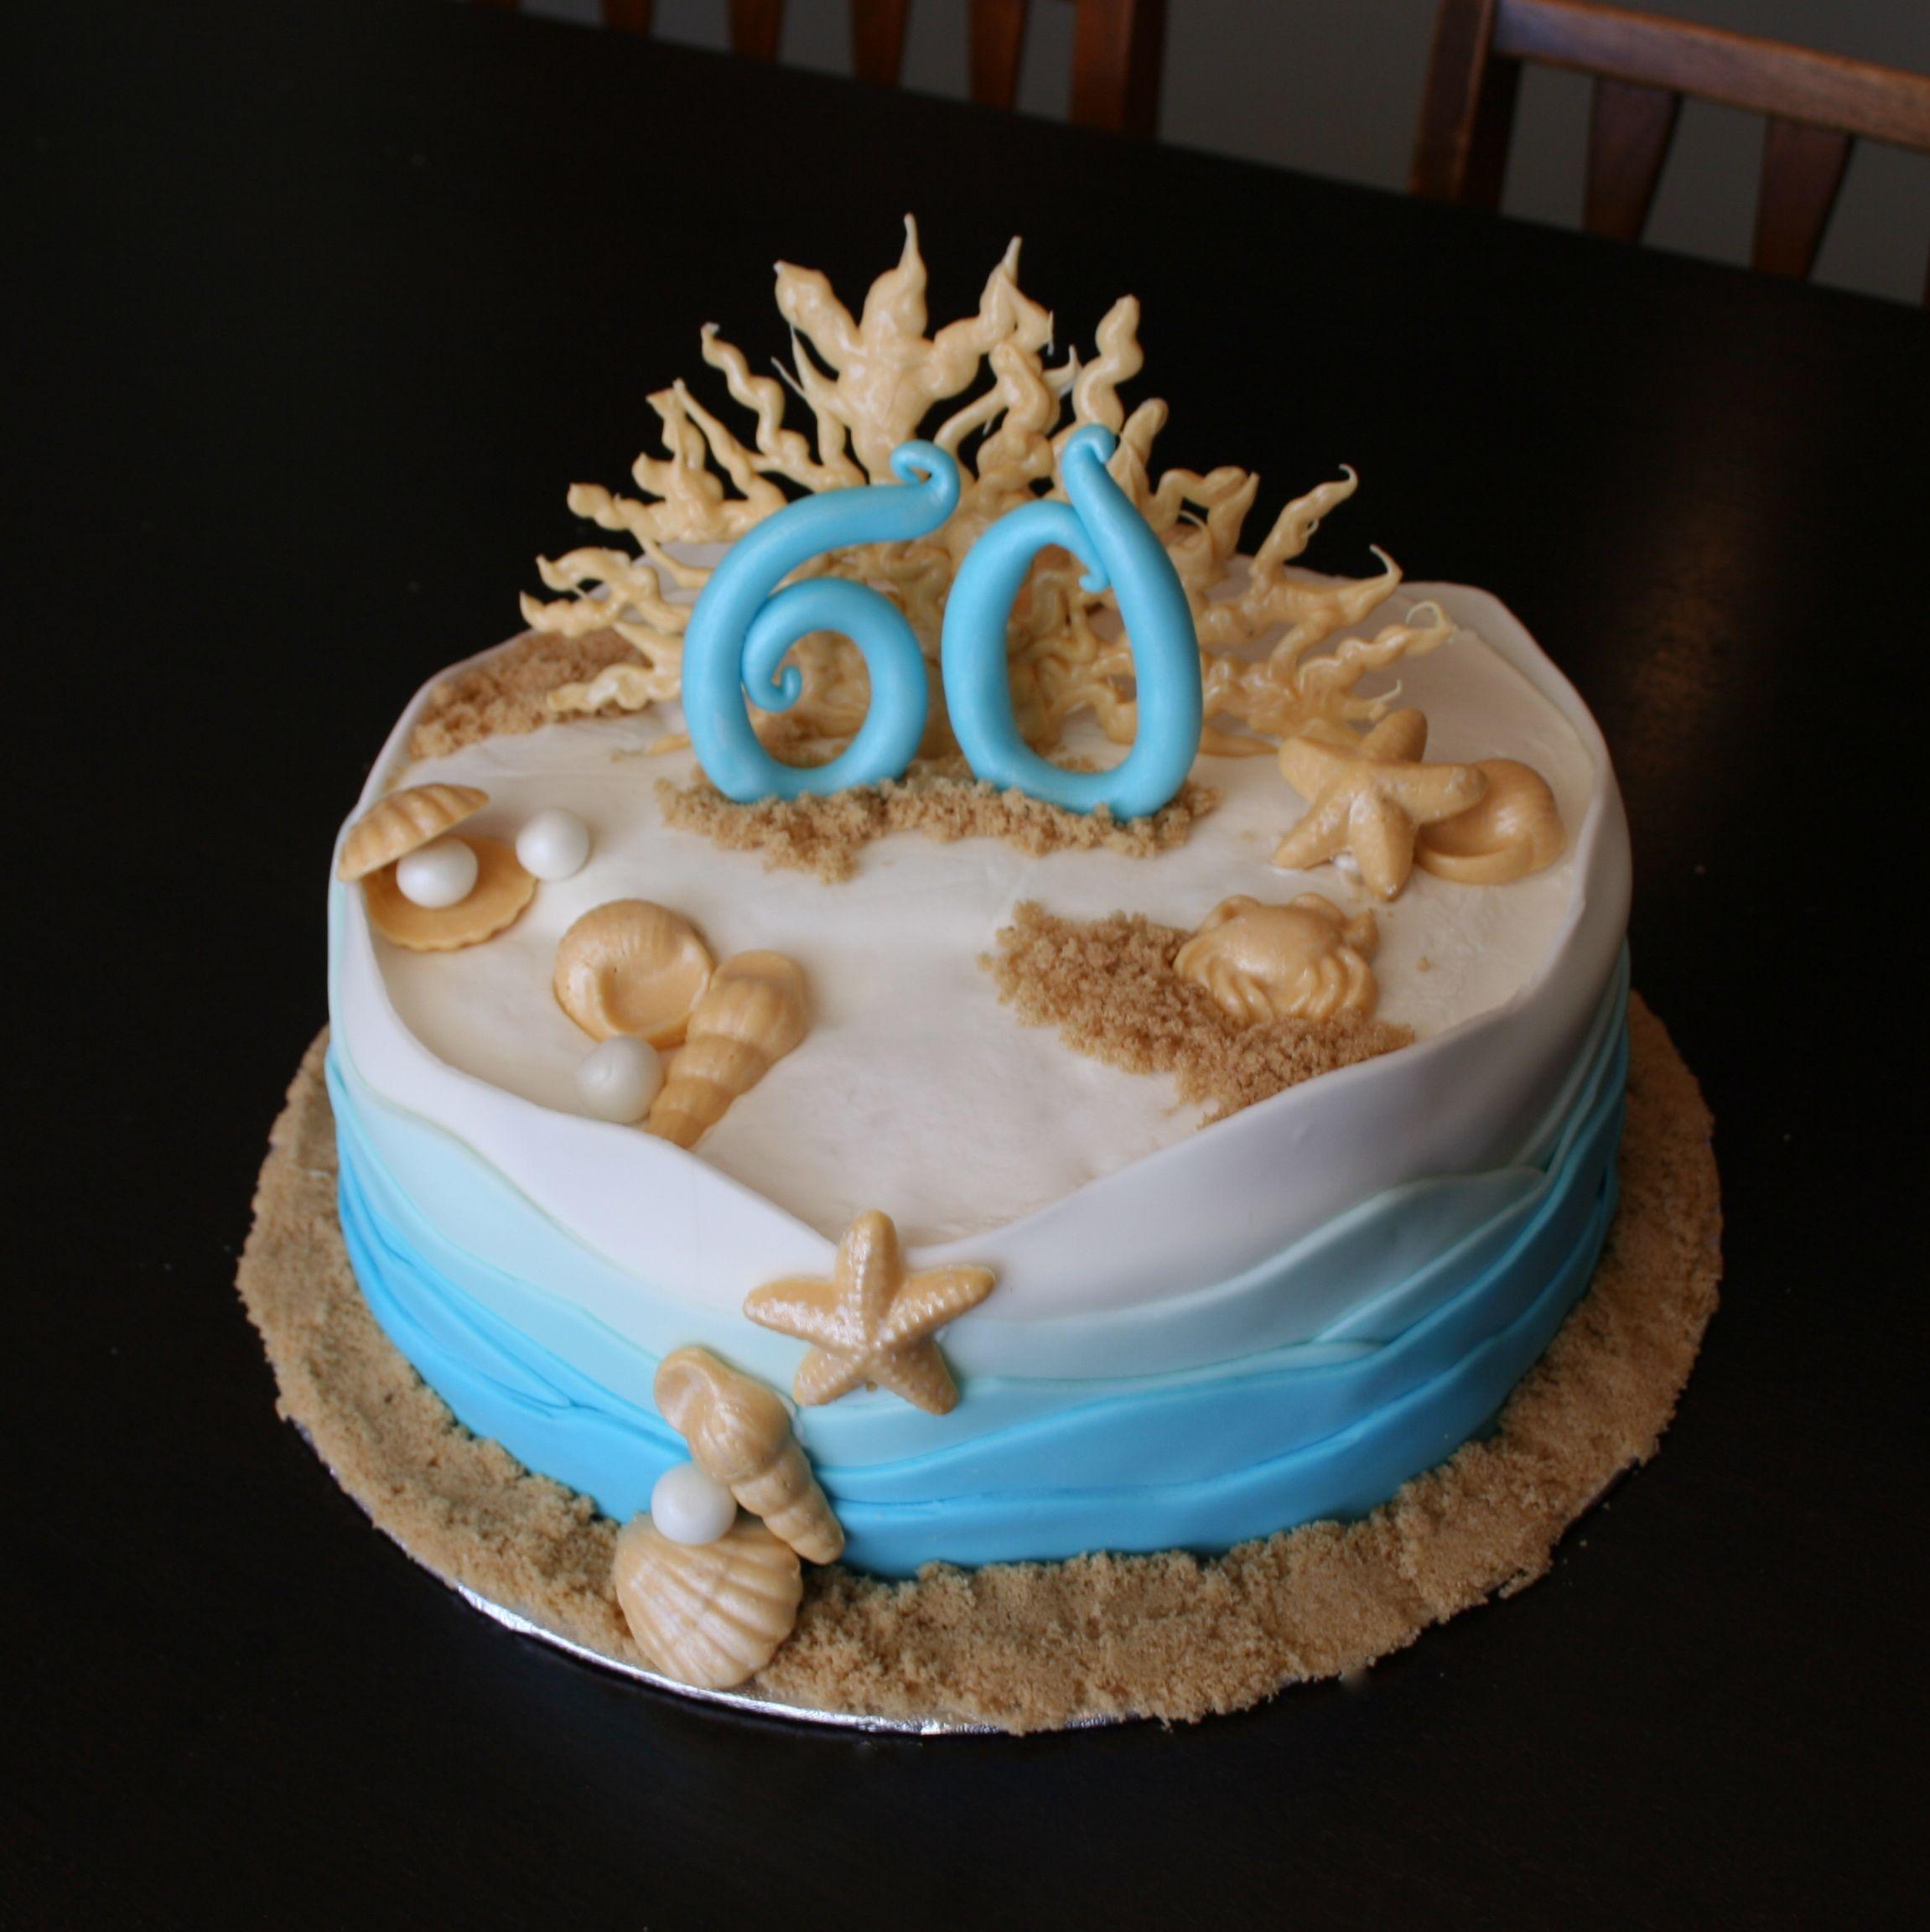 Birthday Cake Ideas Beach : Sophisticated, Elegant, Coastal Beach Themed 60th Birthday ...